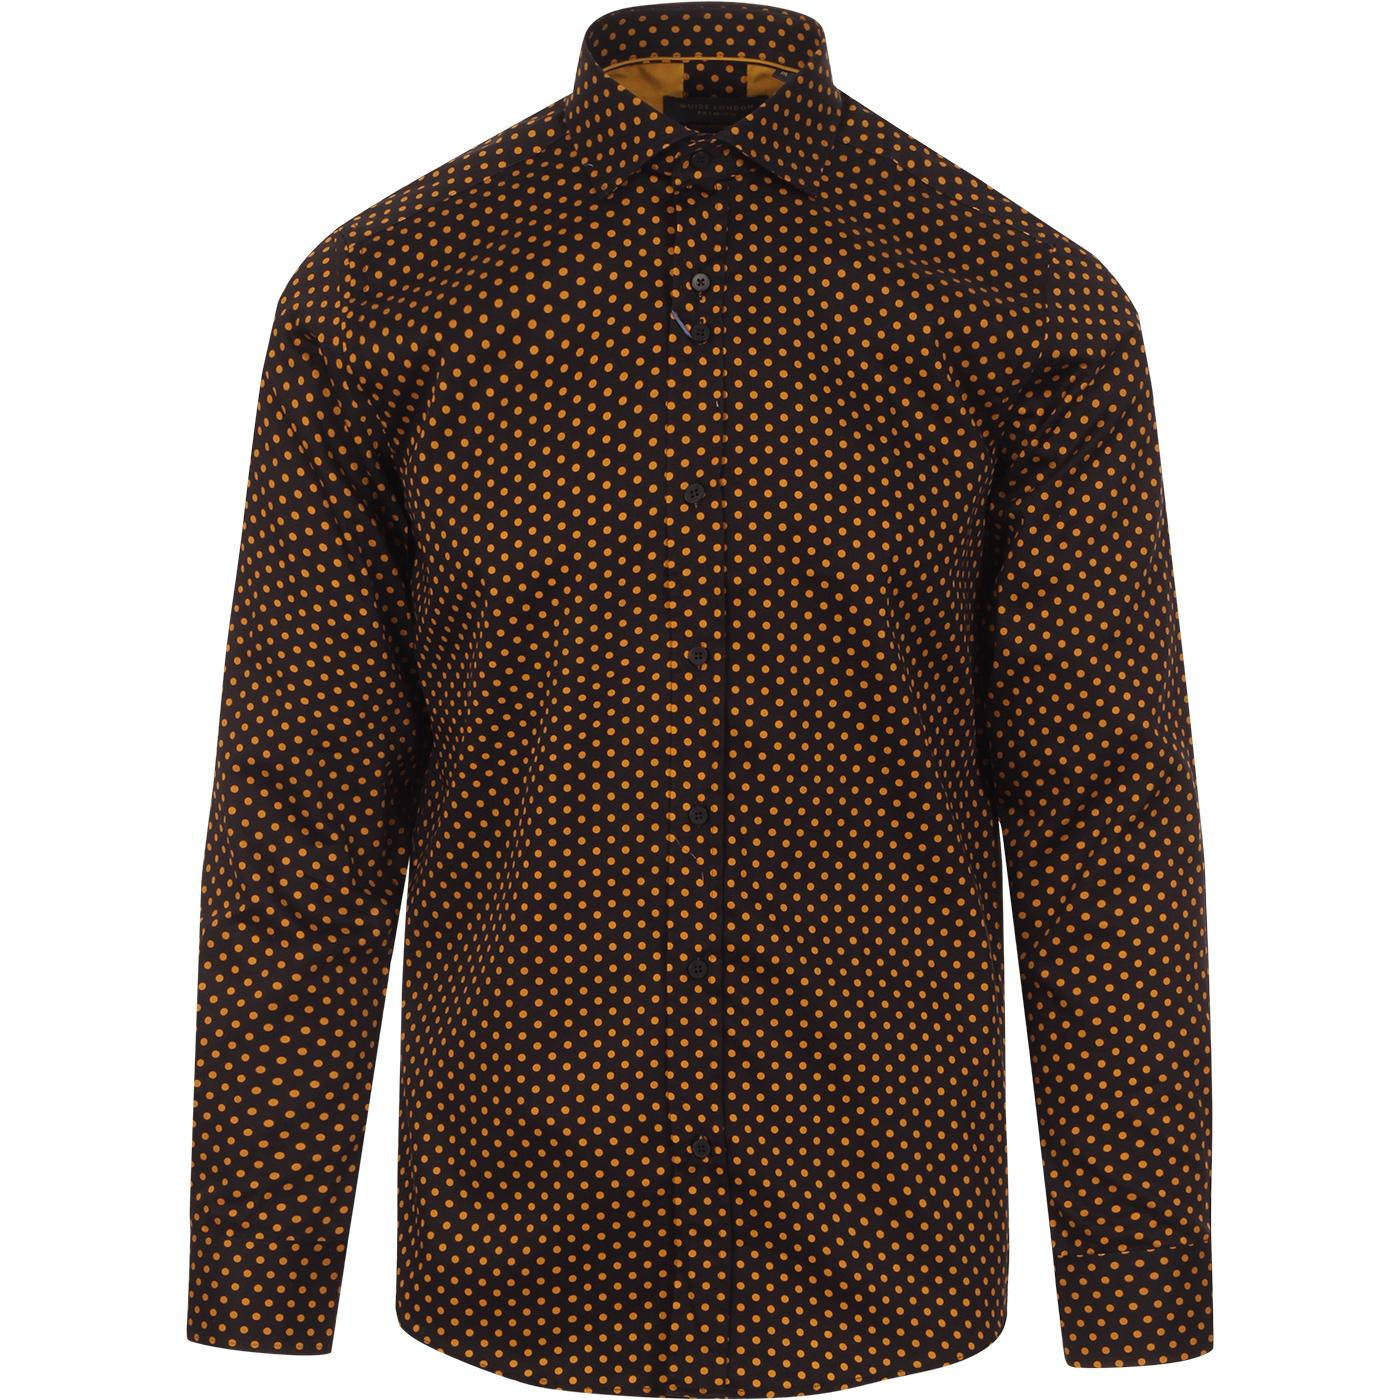 GUIDE LONDON 60s Mod Polka Dot Shirt (Black/Tan)